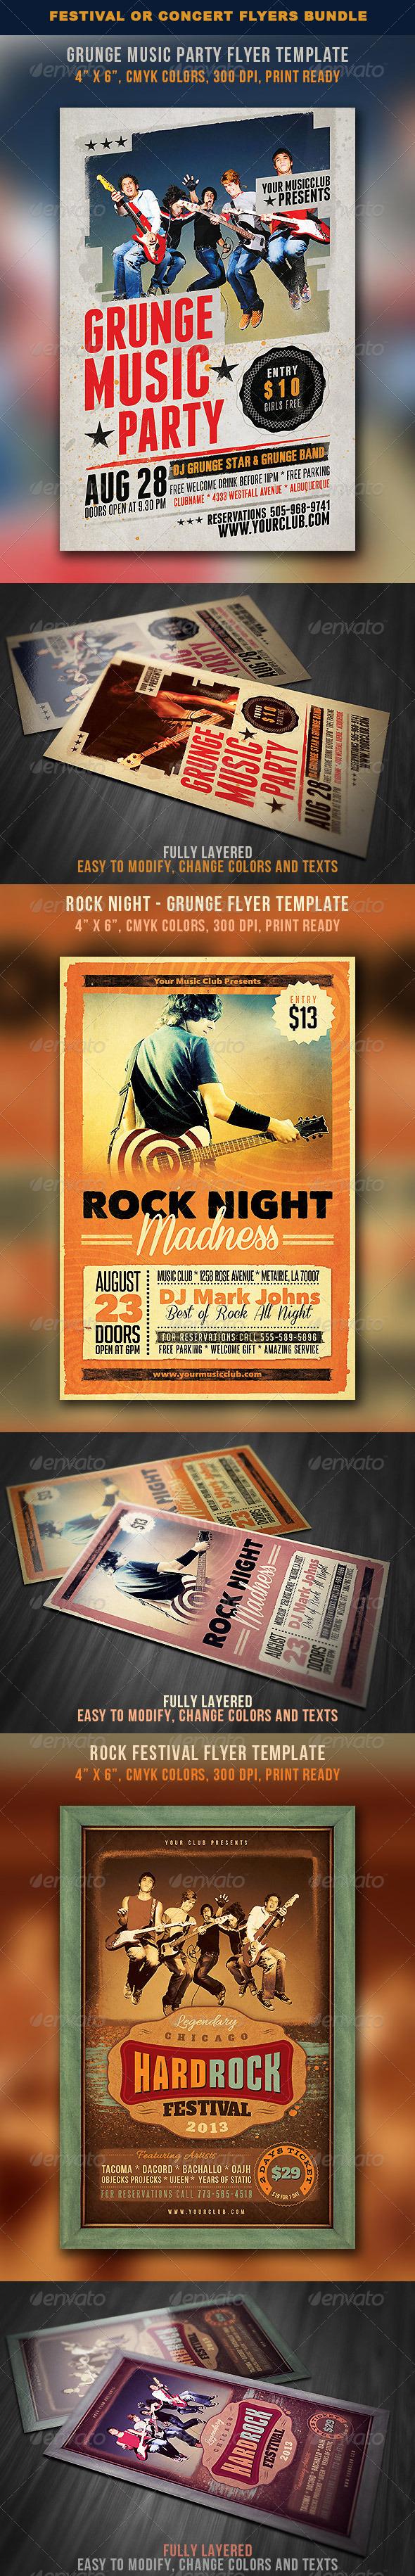 GraphicRiver Festival or Concert Flyers Bundle 5320718